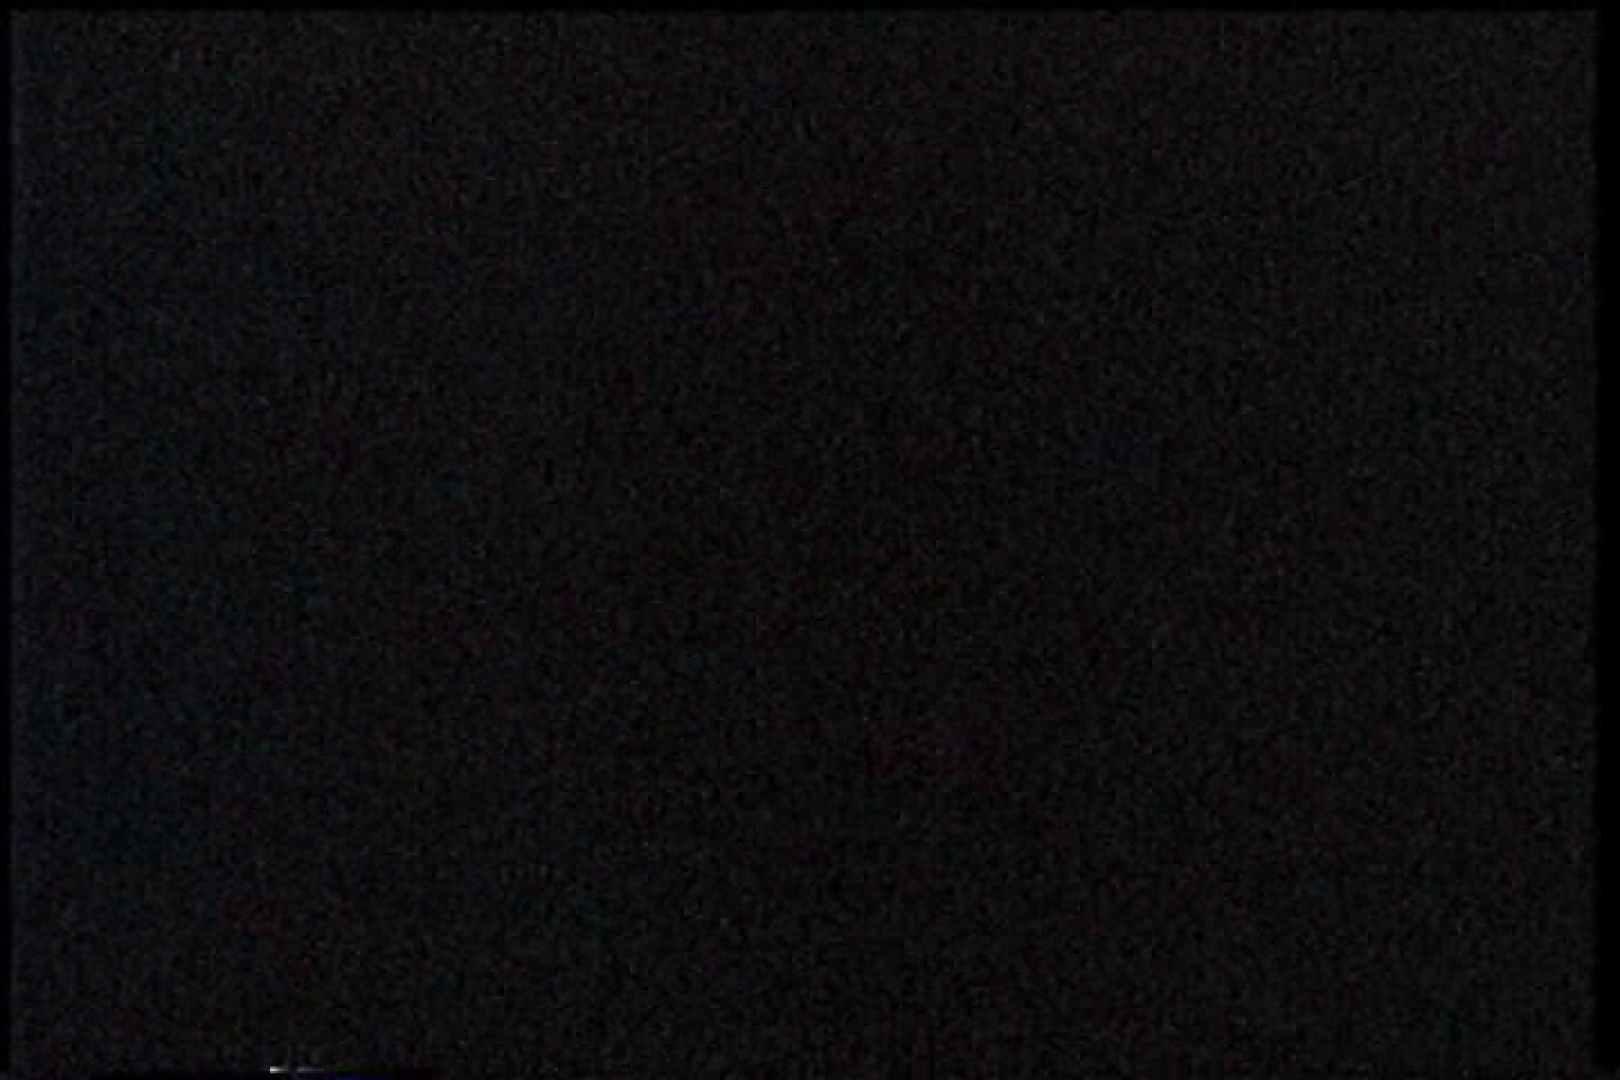 充血監督の深夜の運動会Vol.220 美女OL セックス無修正動画無料 79連発 14